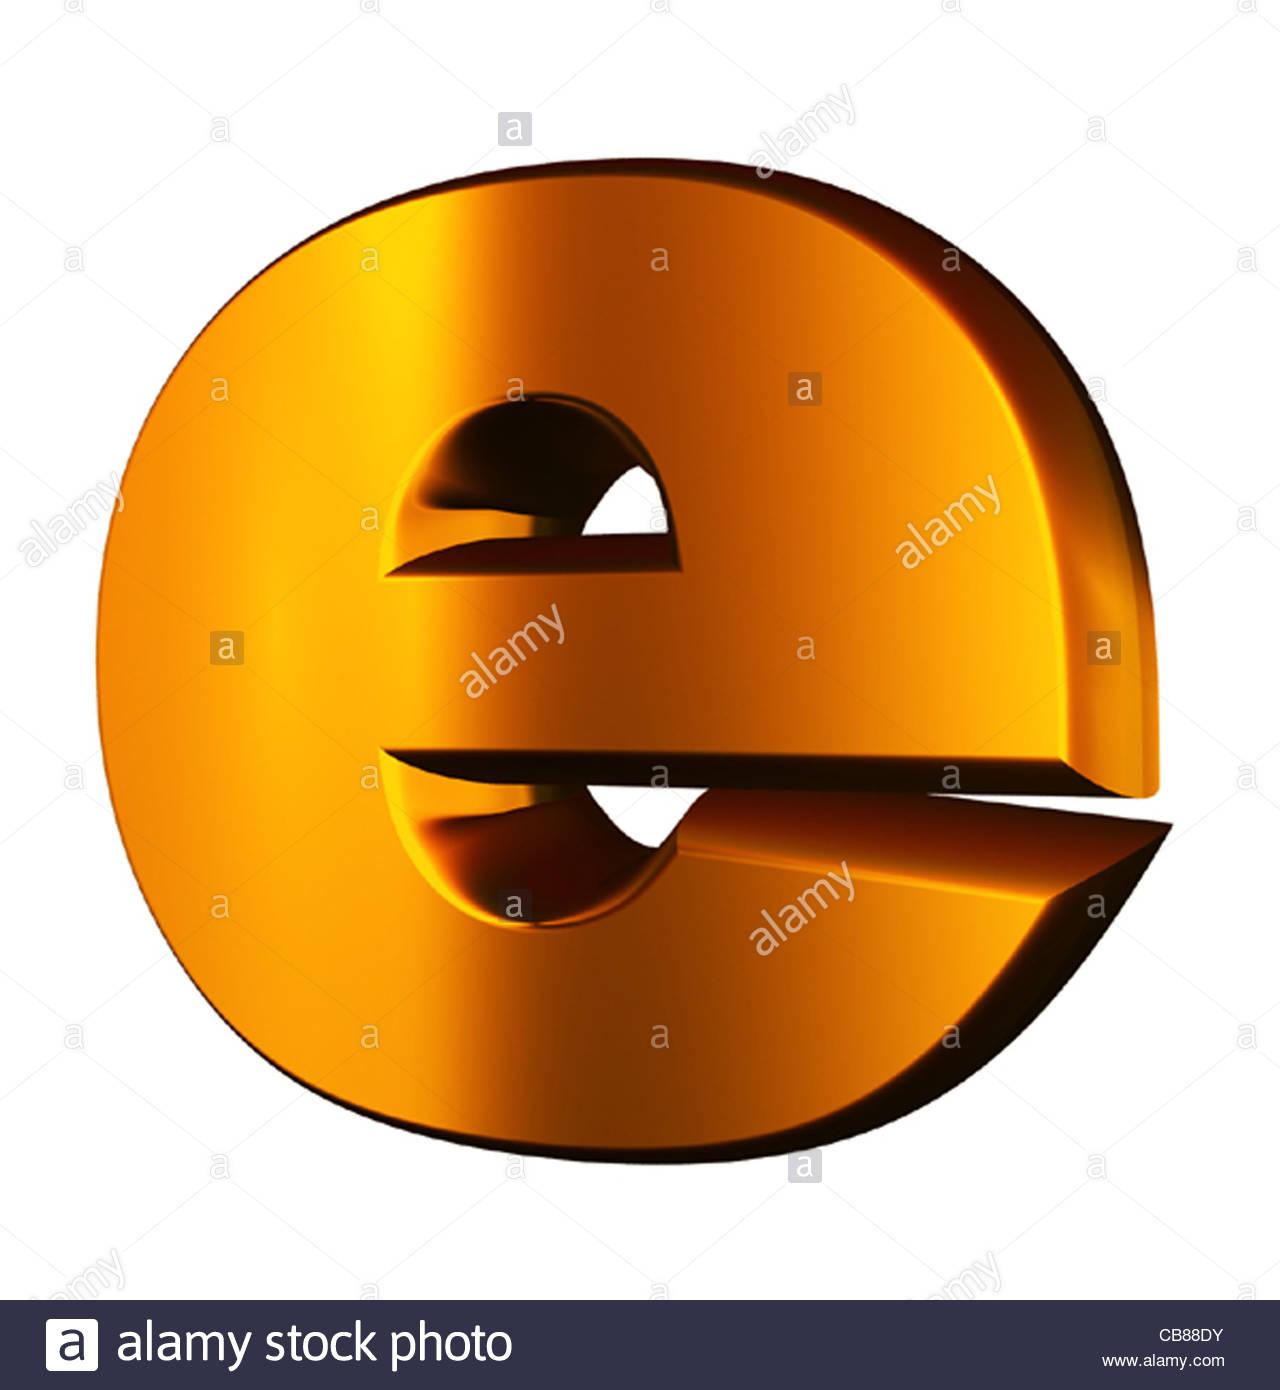 Symbol at bottom of internet explorer